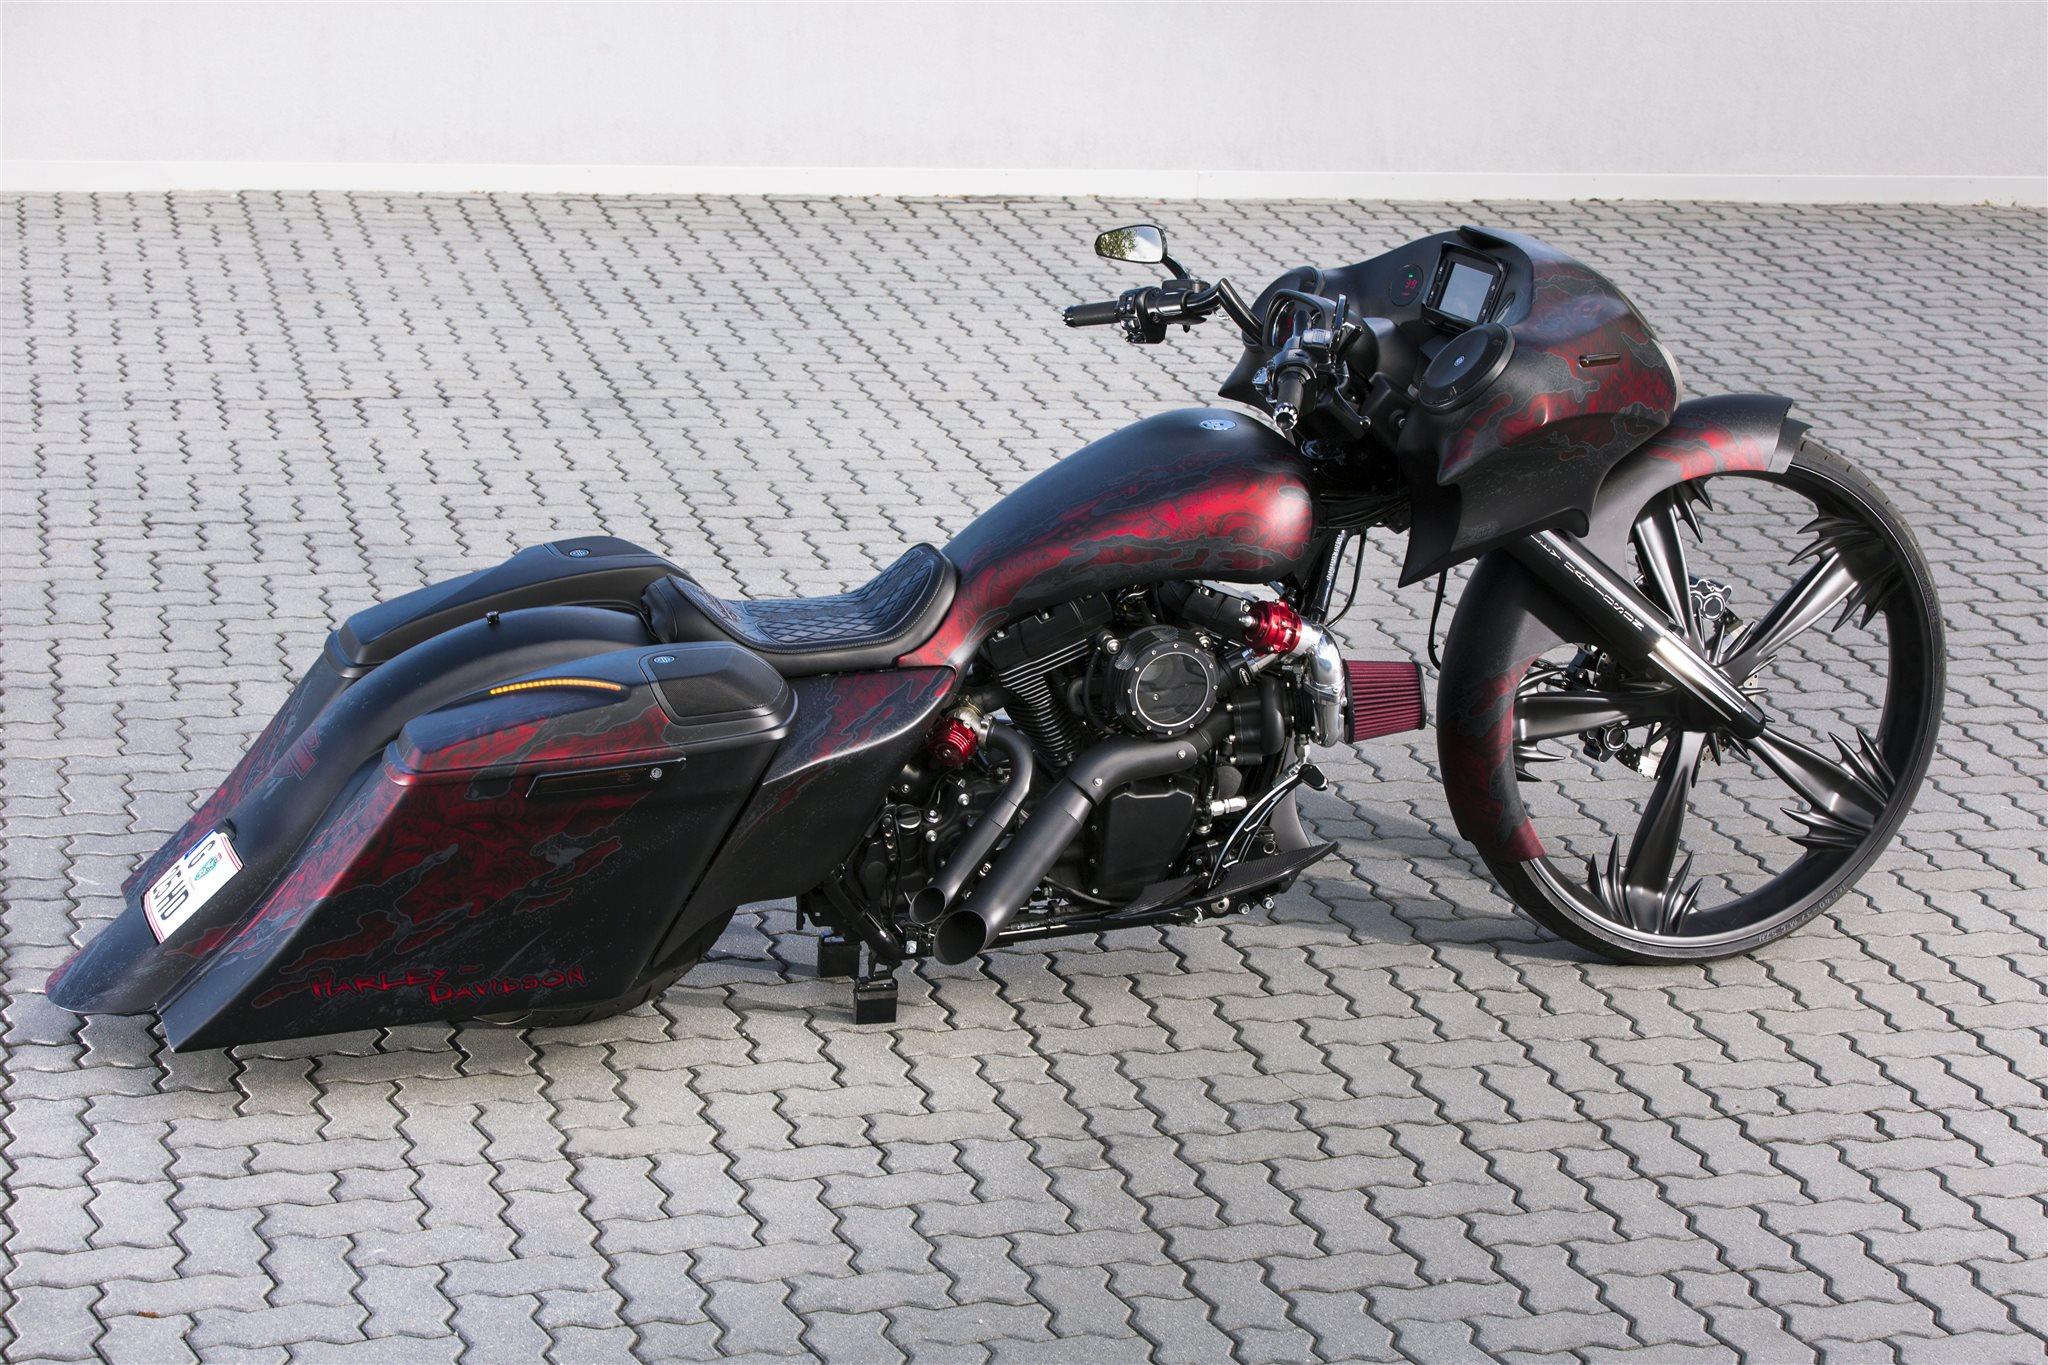 gebrauchte harley davidson custom bike erstzulassung. Black Bedroom Furniture Sets. Home Design Ideas